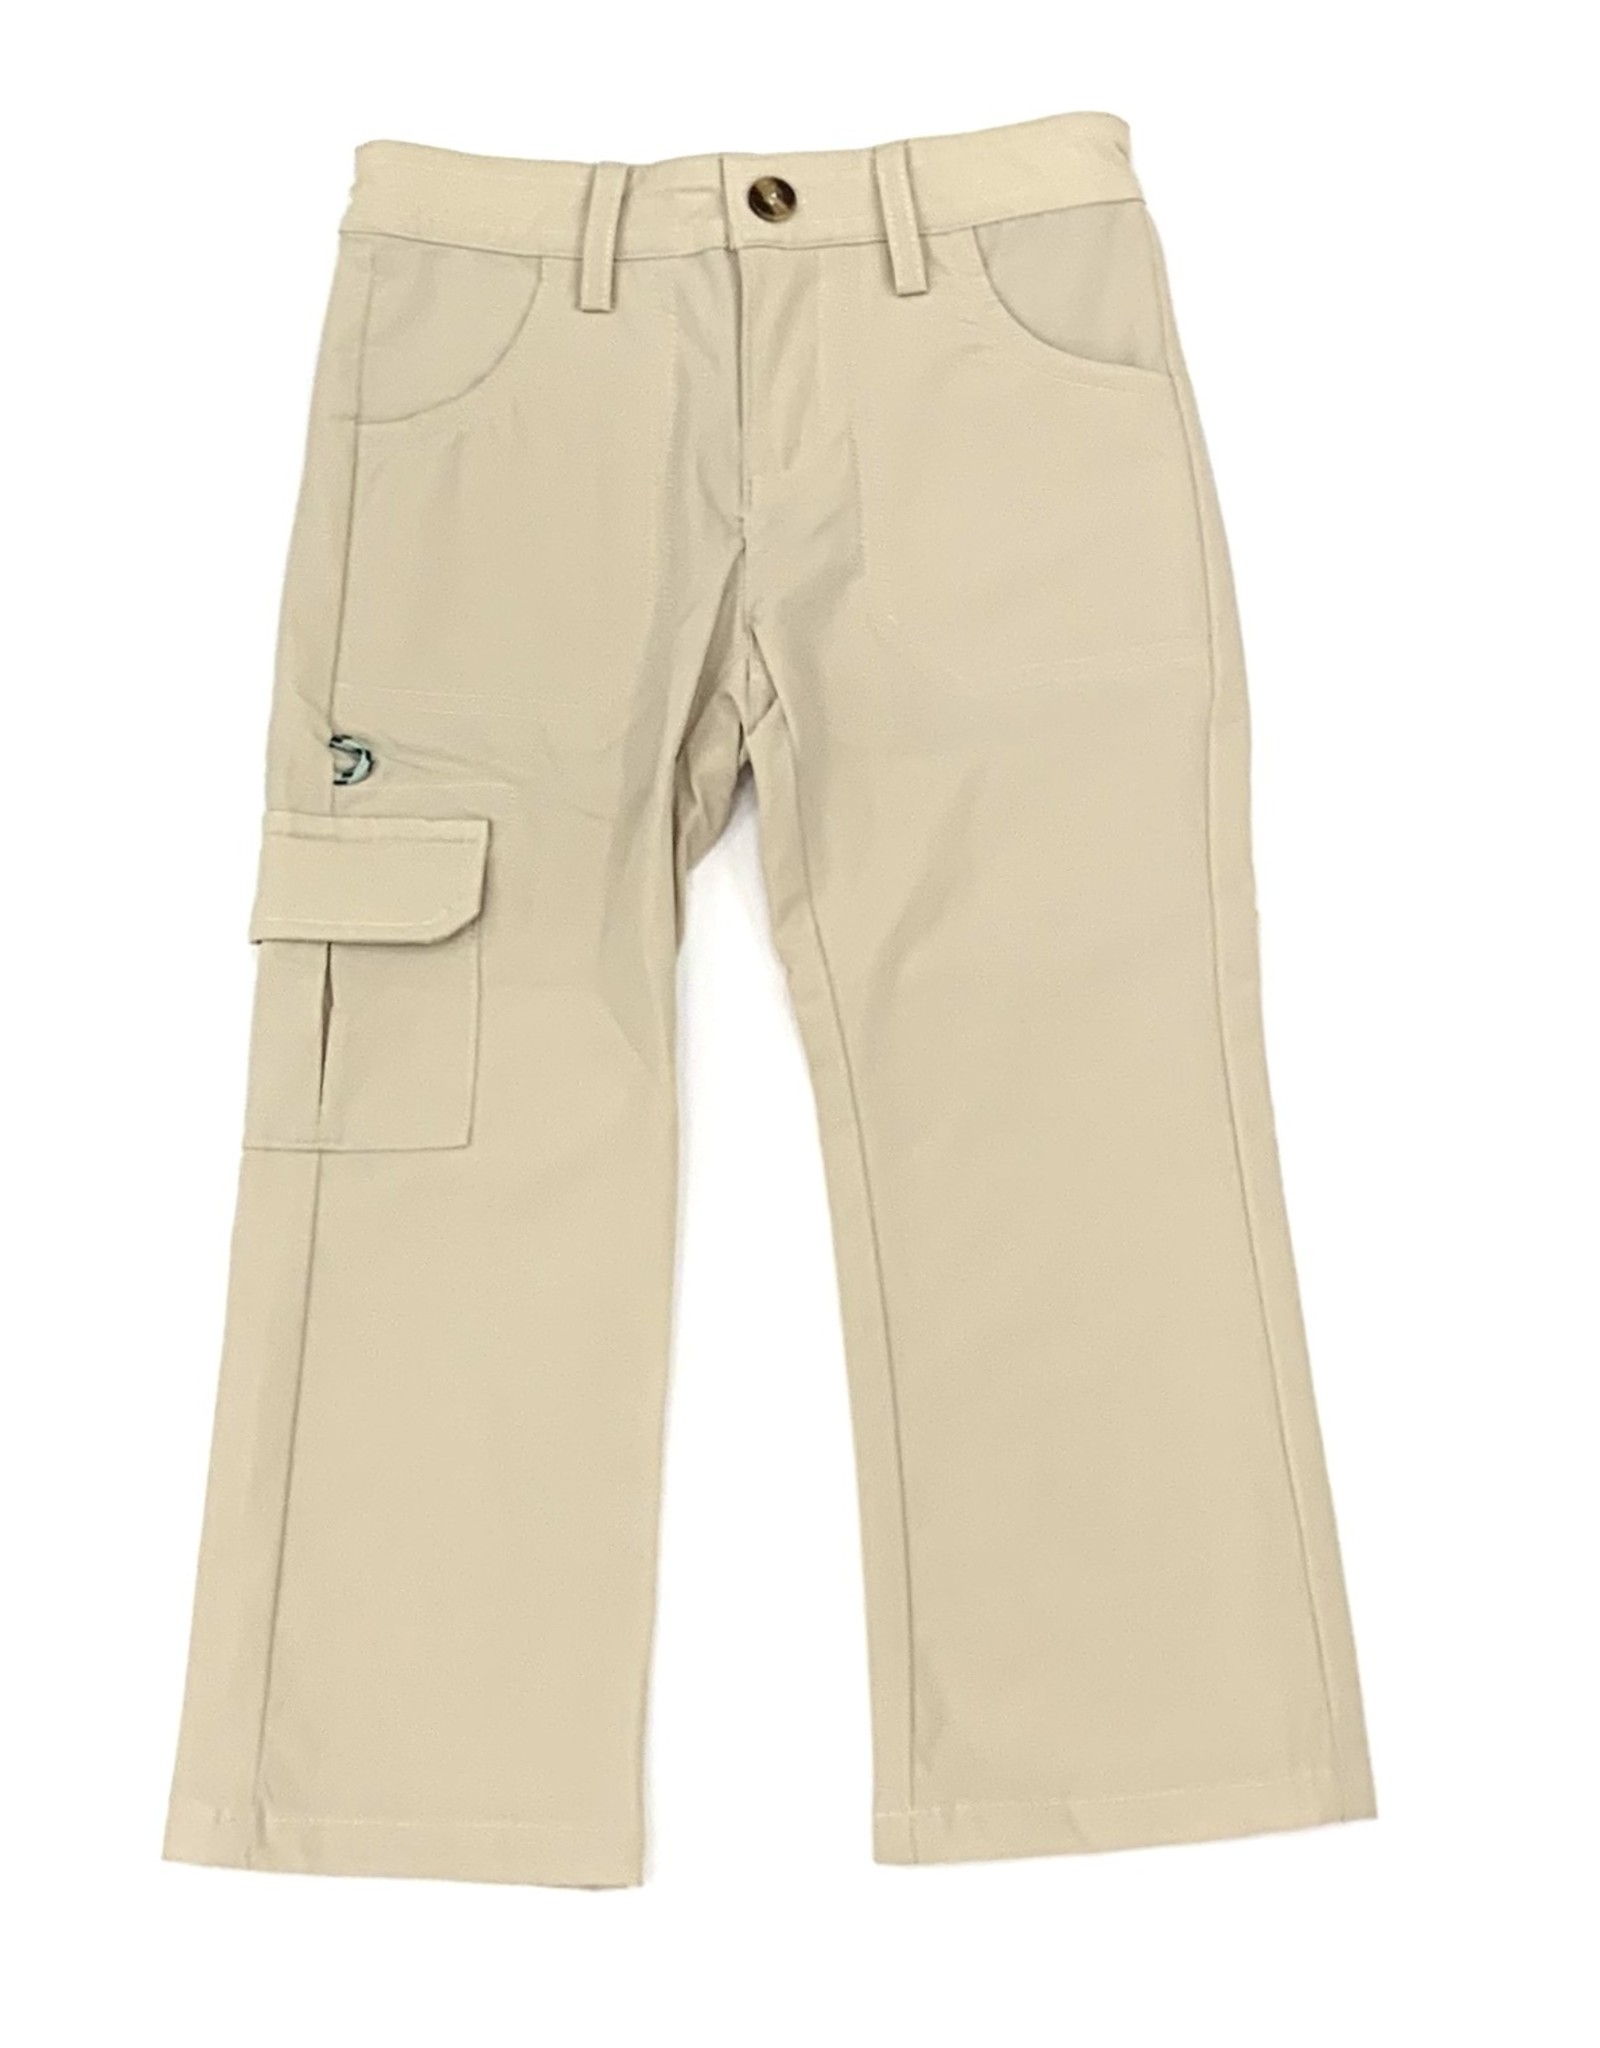 Prodoh Angler Pant